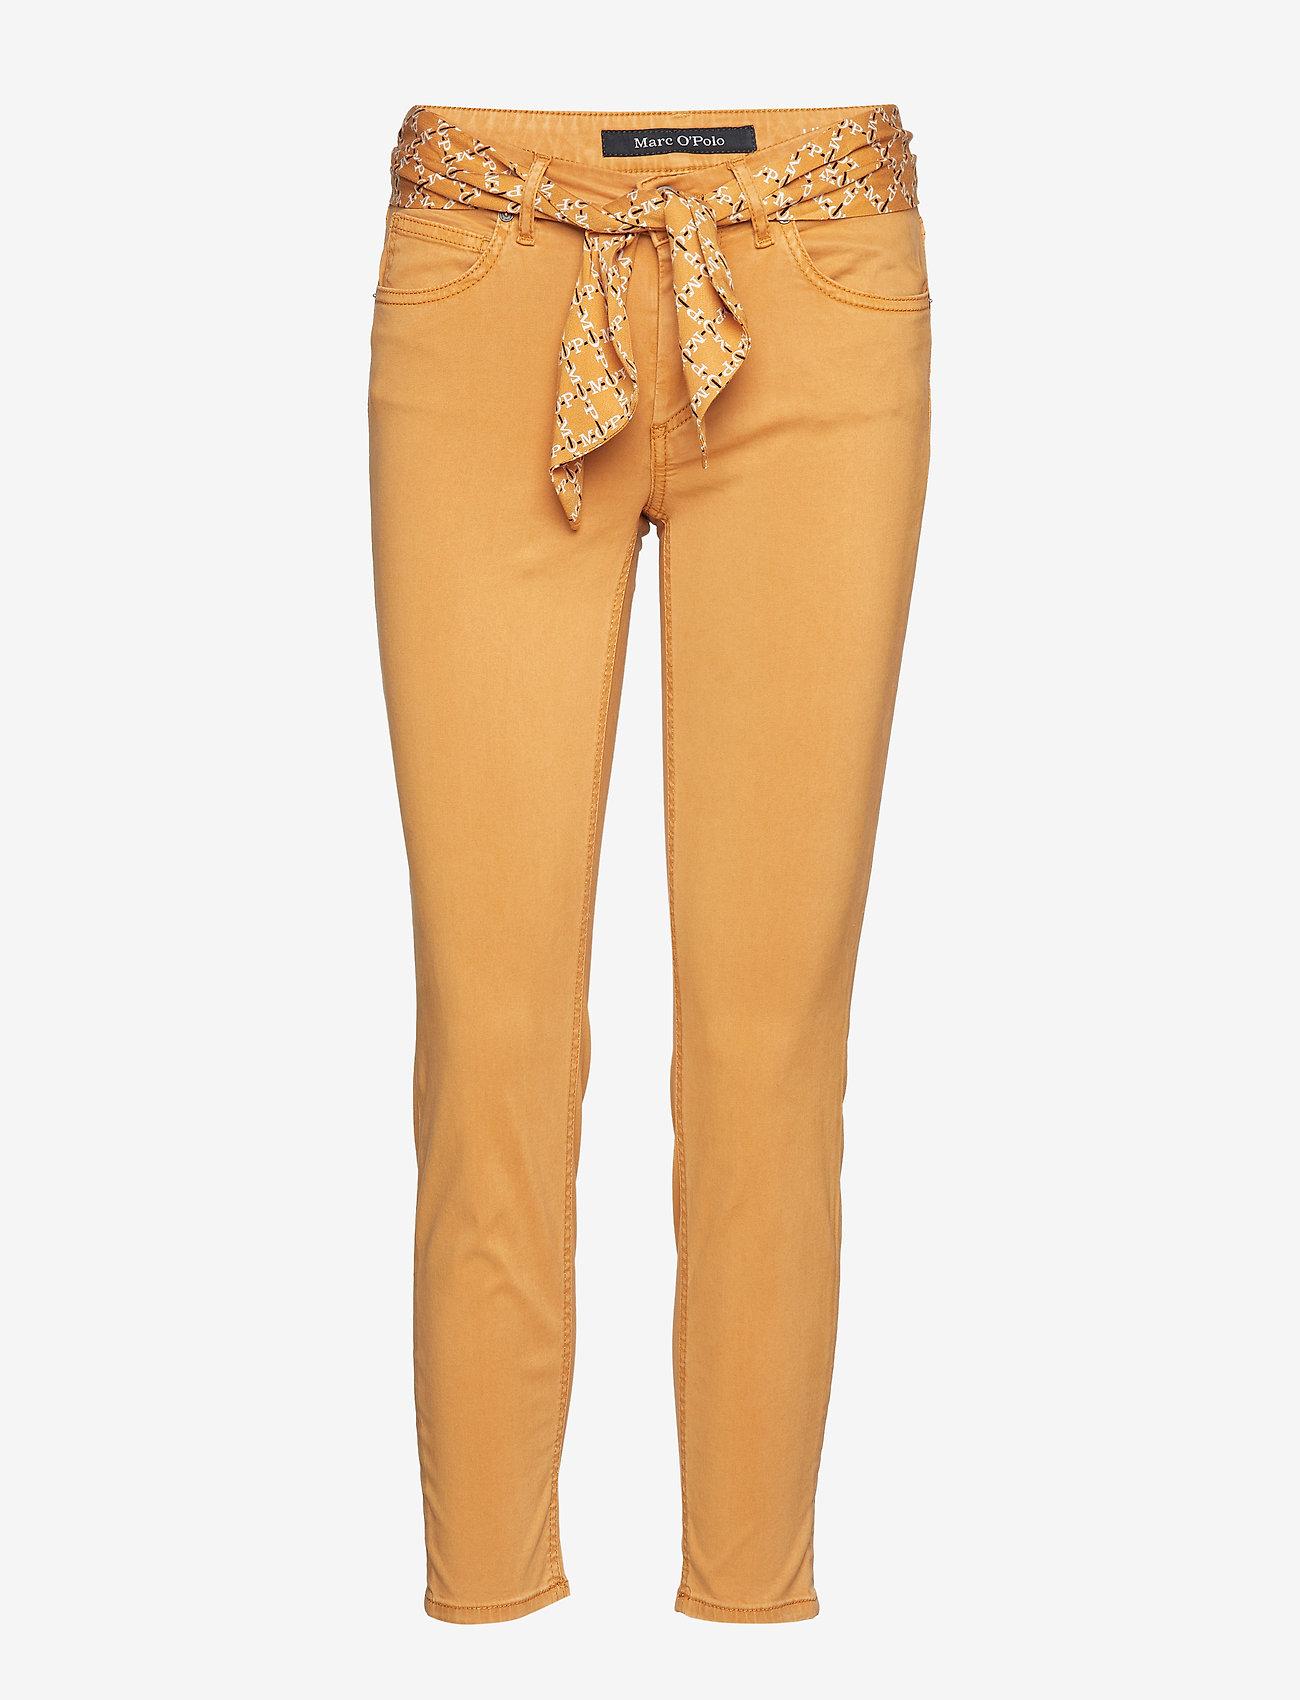 Marc O'Polo - Jeans - skinny jeans - amber wheat - 0